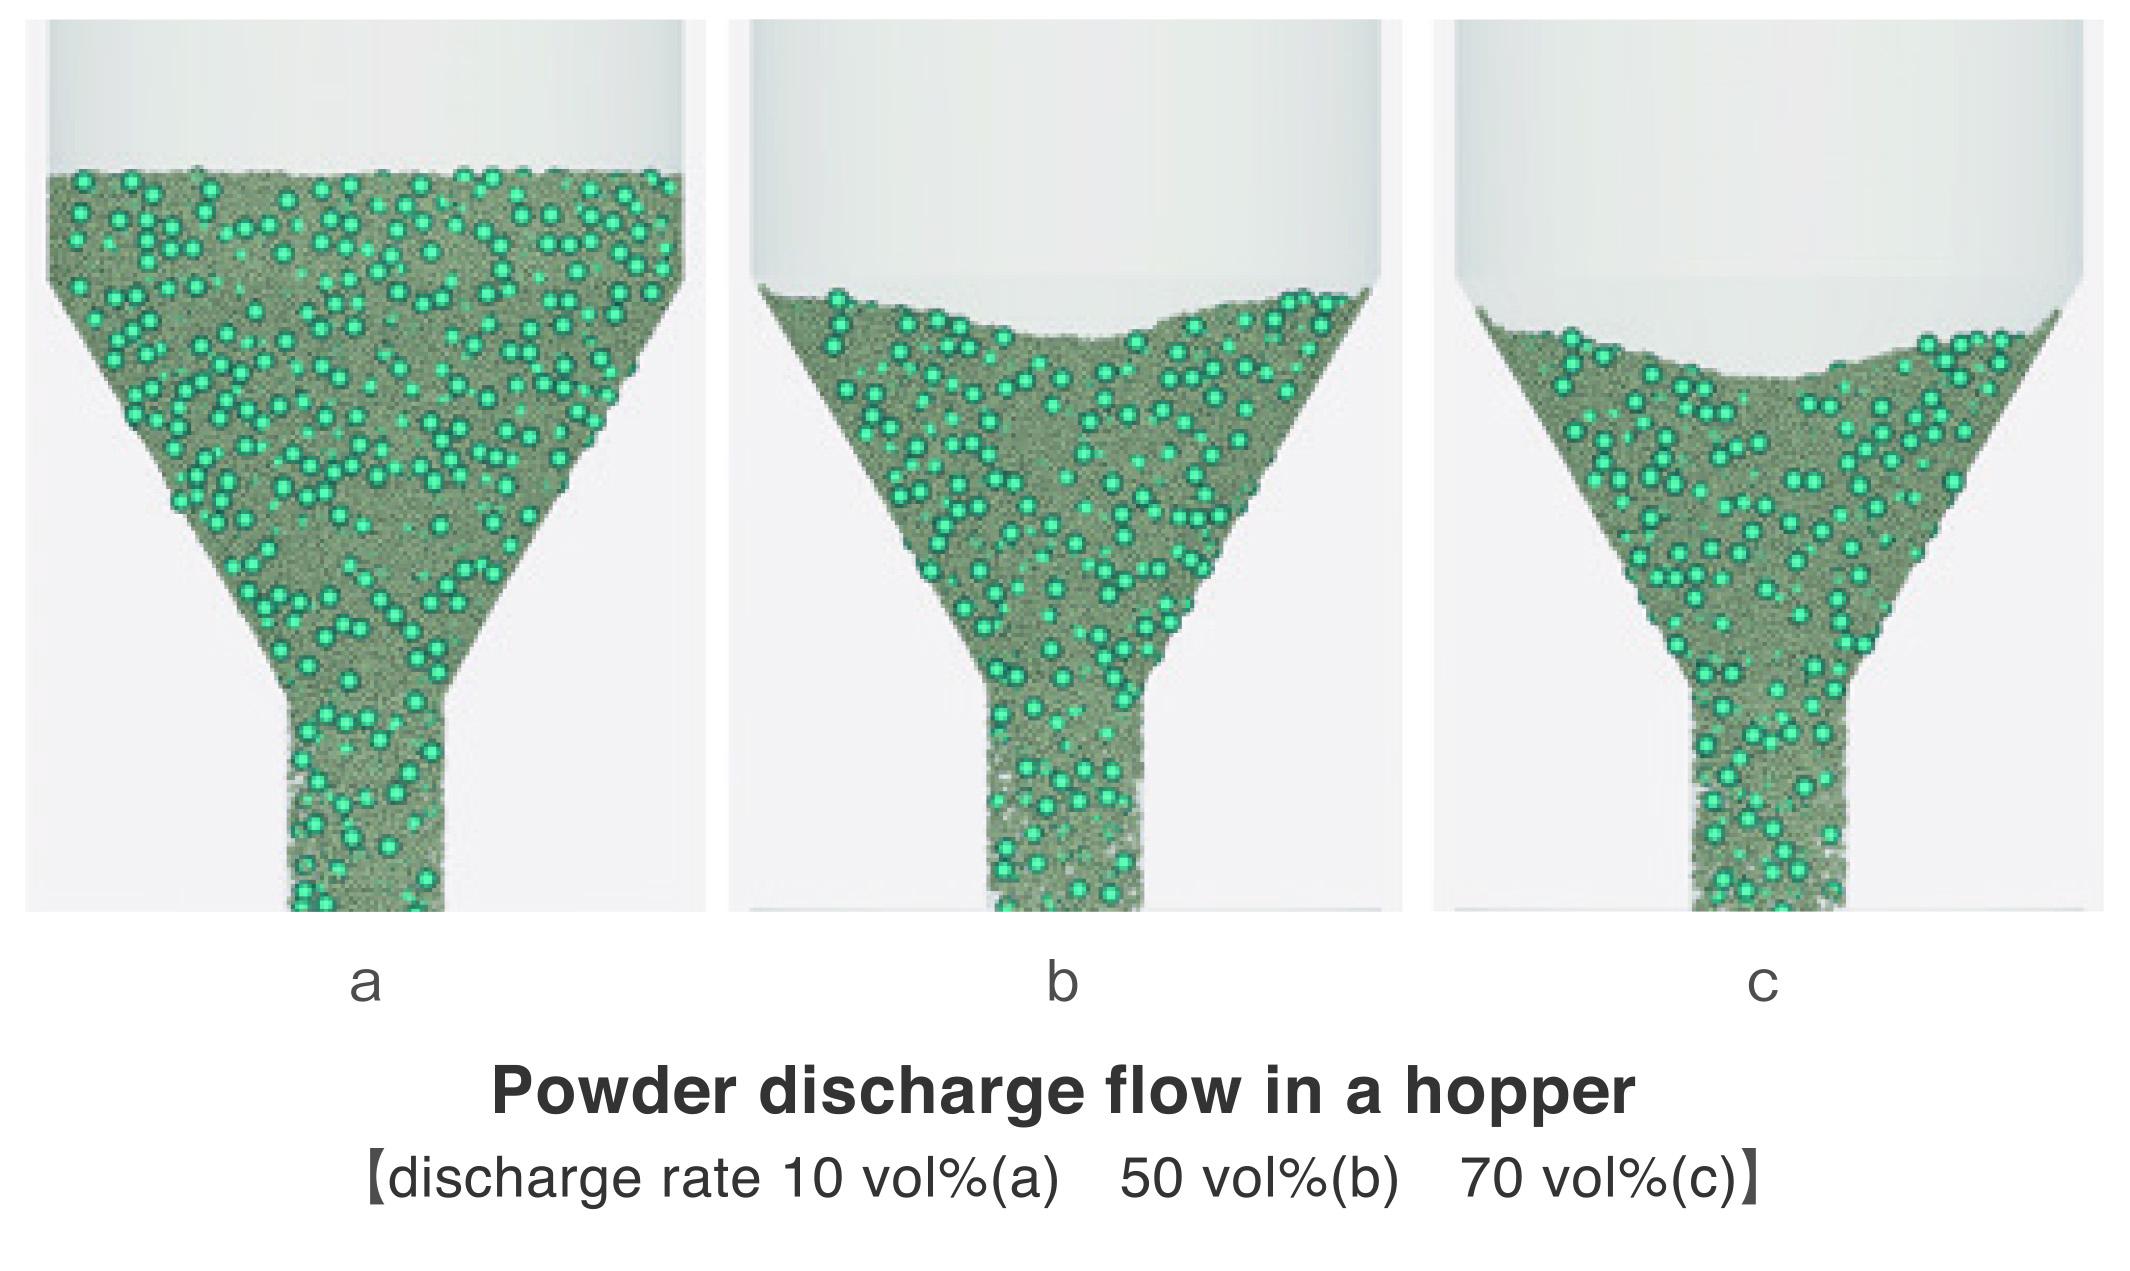 Powder discharge flow in a hopper